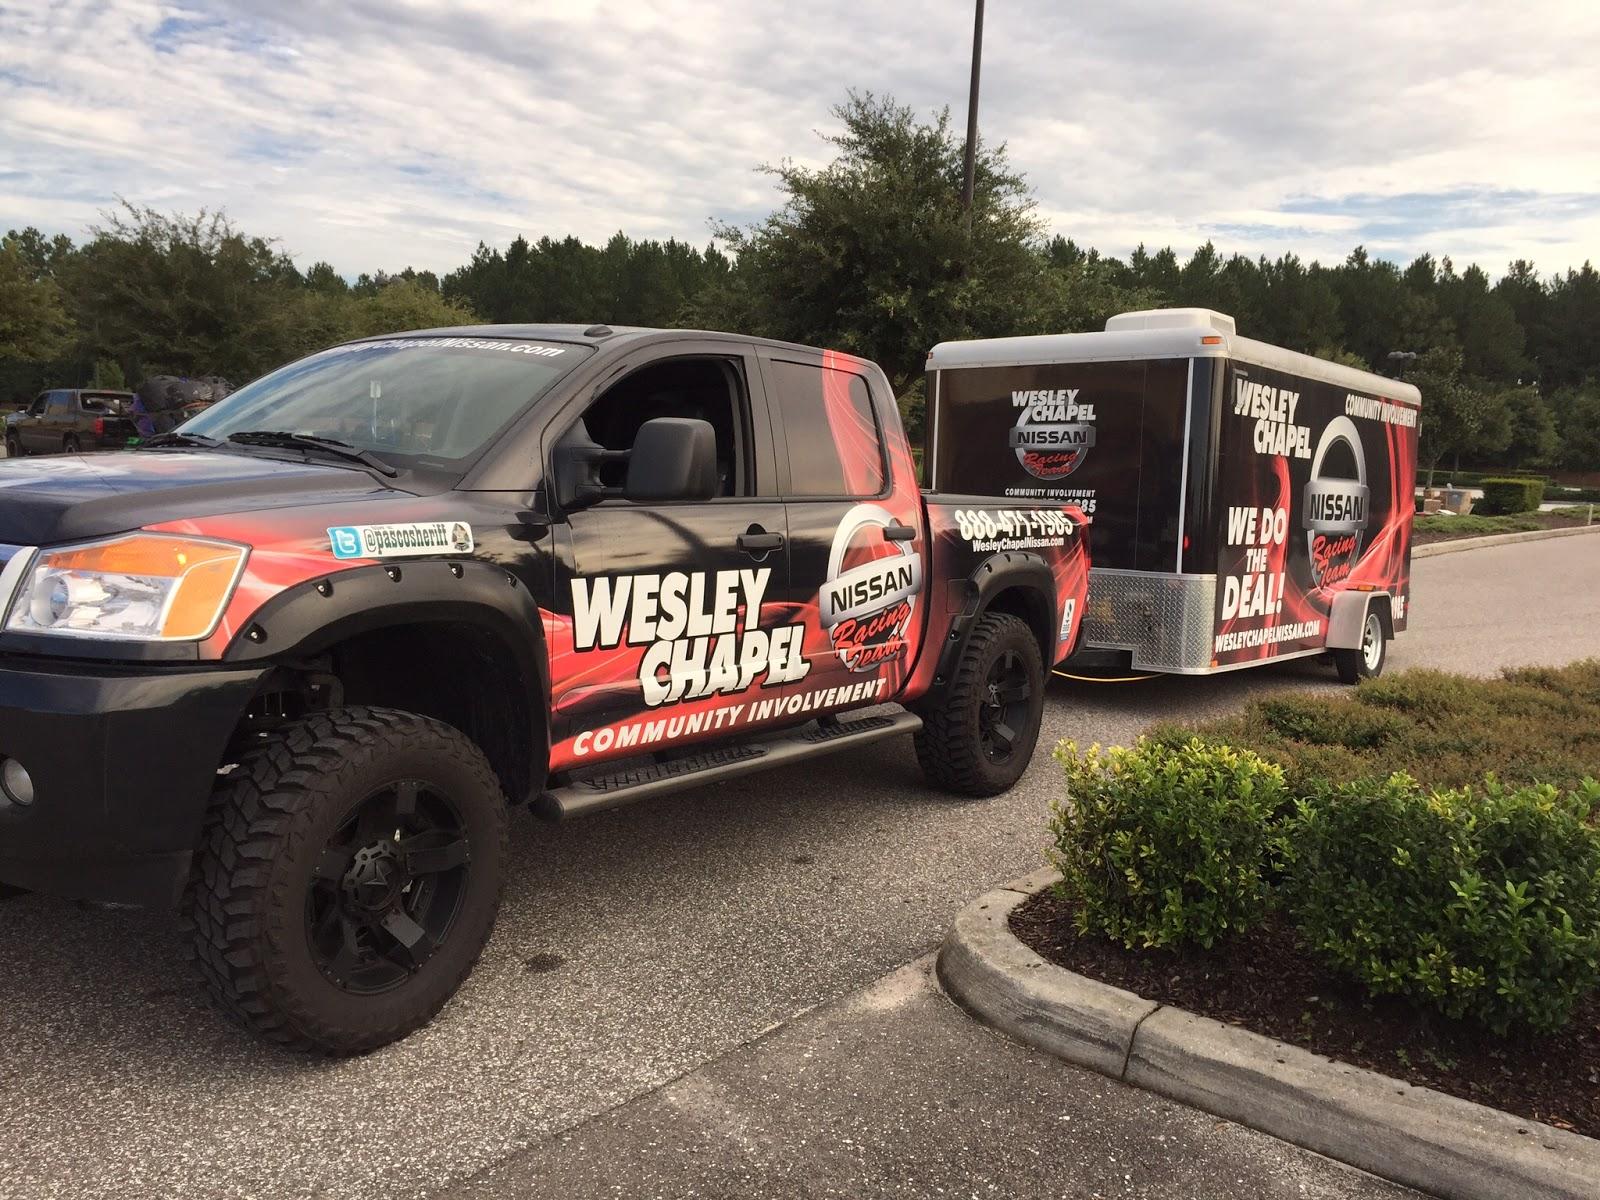 Wesley Chapel Nissan Bogo >> Wesley Chapel Nissan: Back to School Bash with Wesley Chapel Nissan